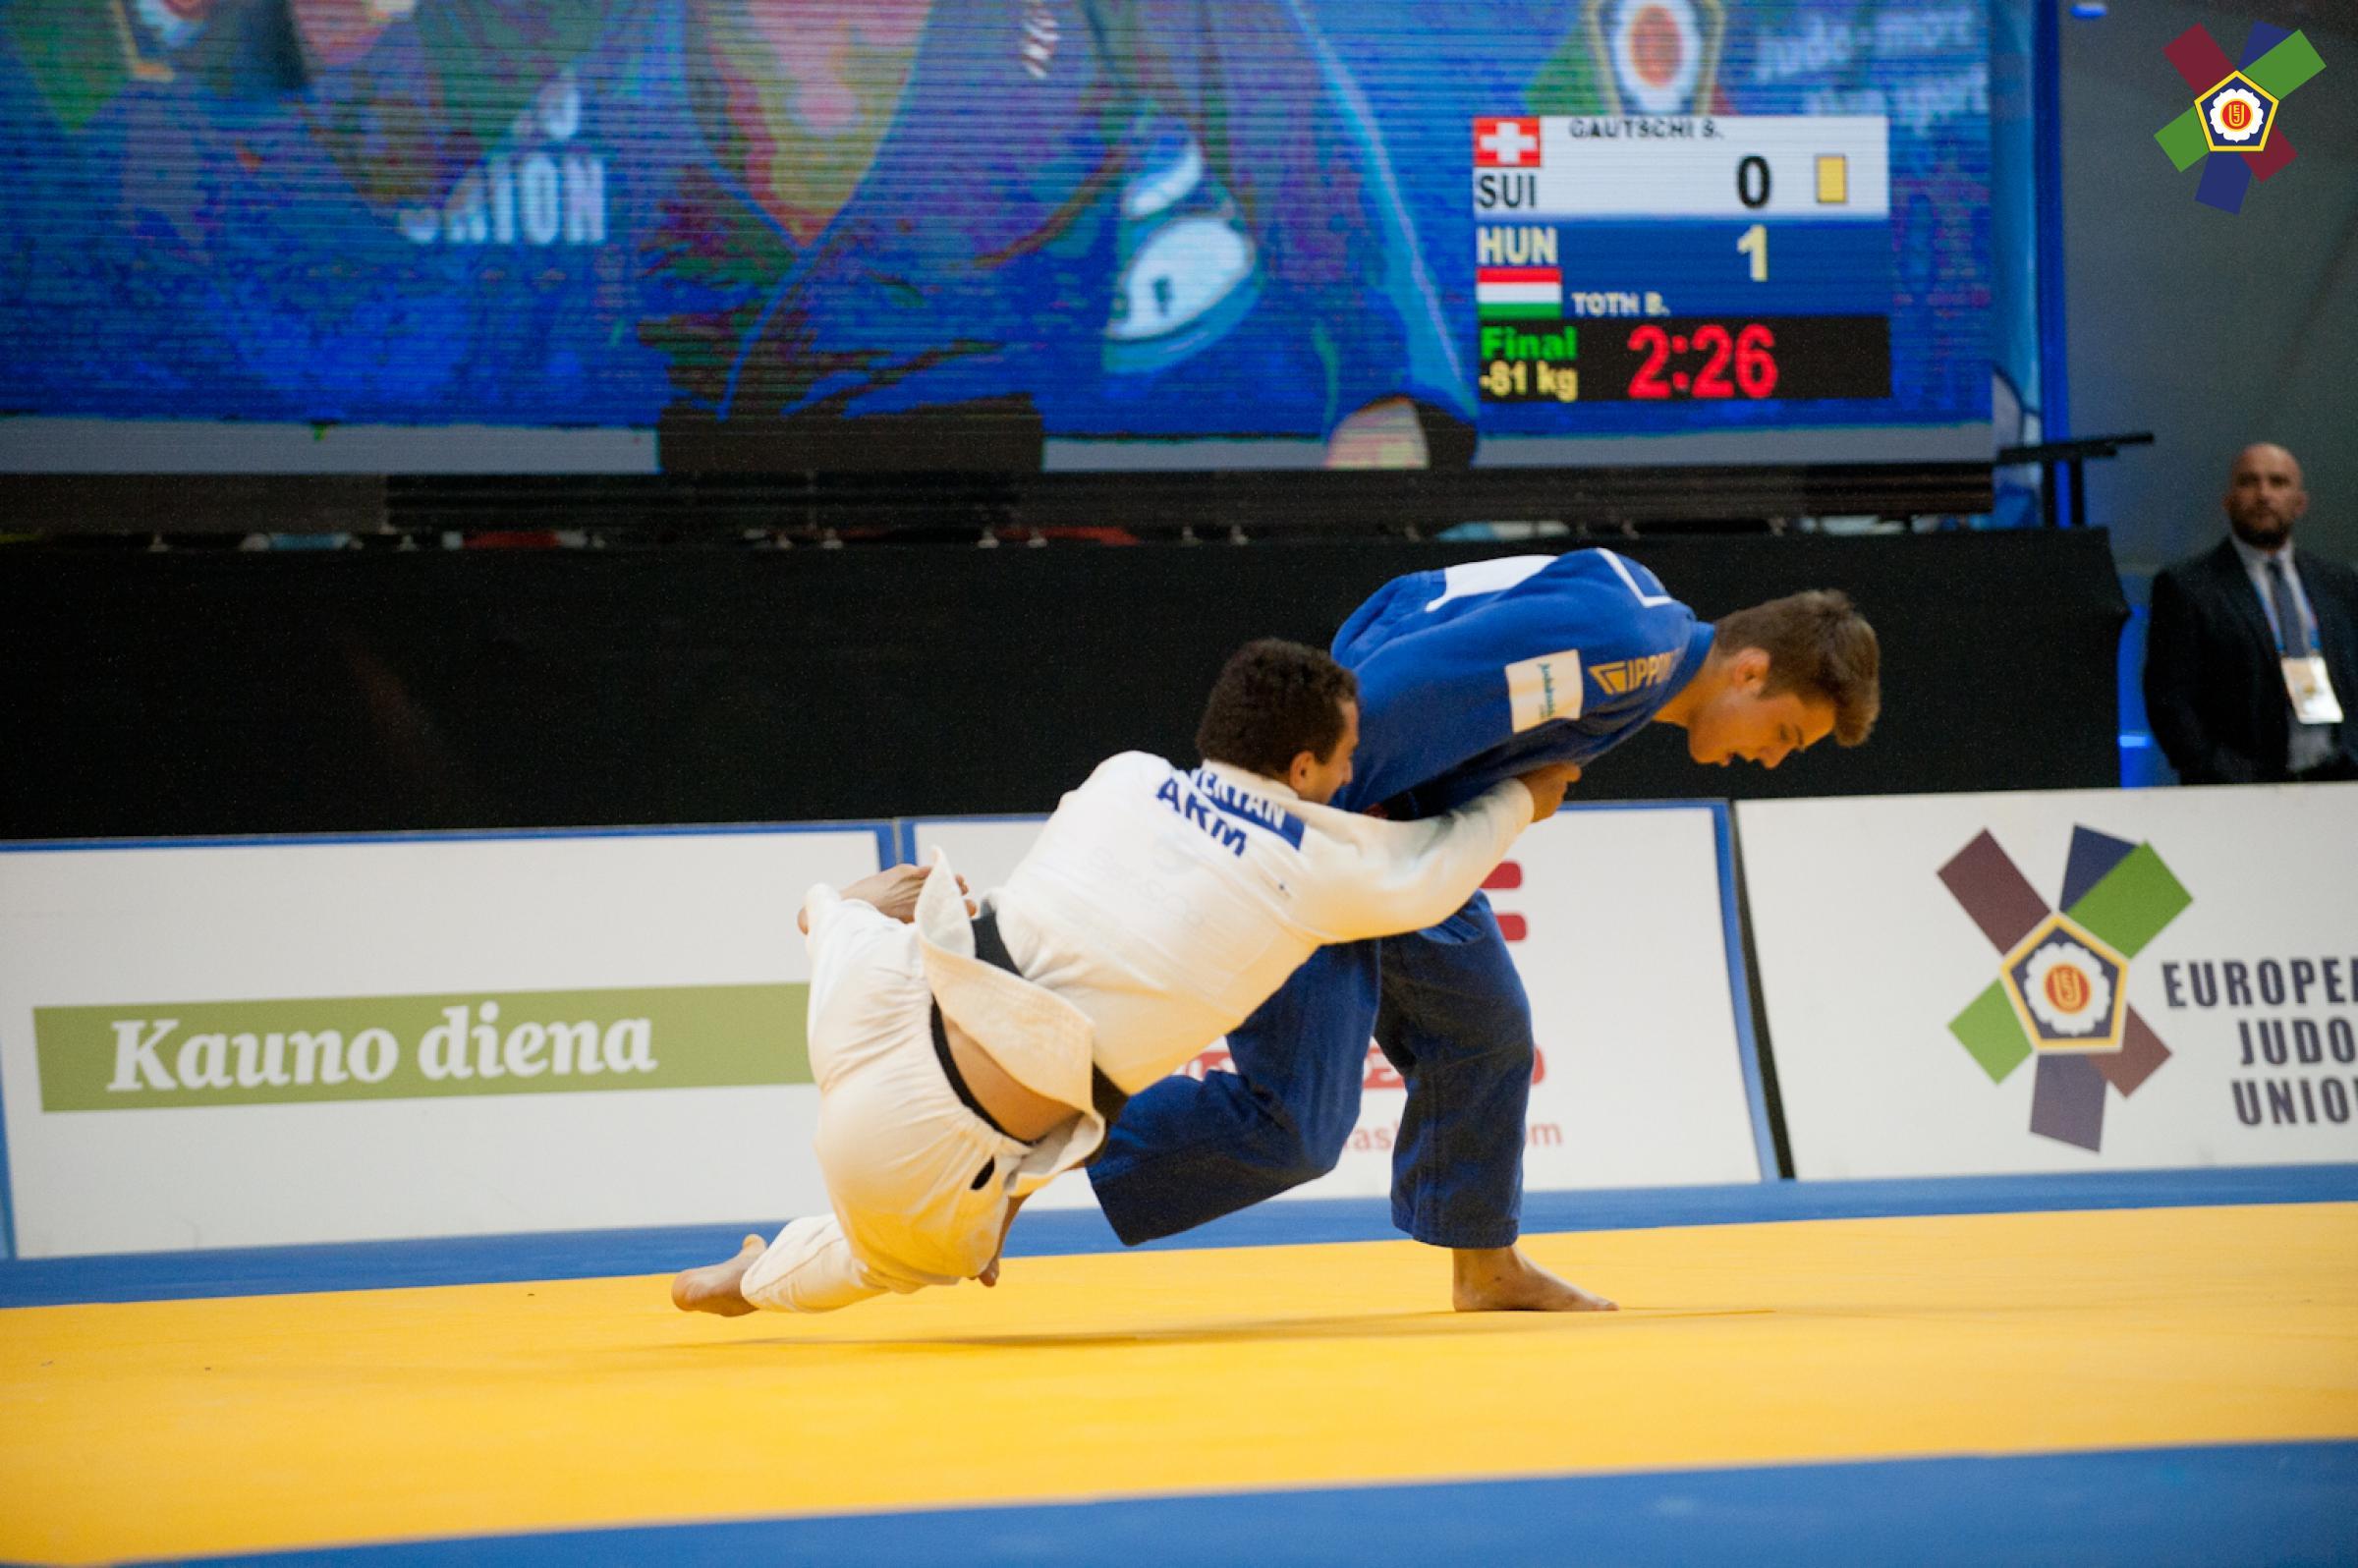 Judo-Junior-European-cup-Kaunas-Lithuania-2019-TOTH-Benedek-Hungary-81-kg-gold